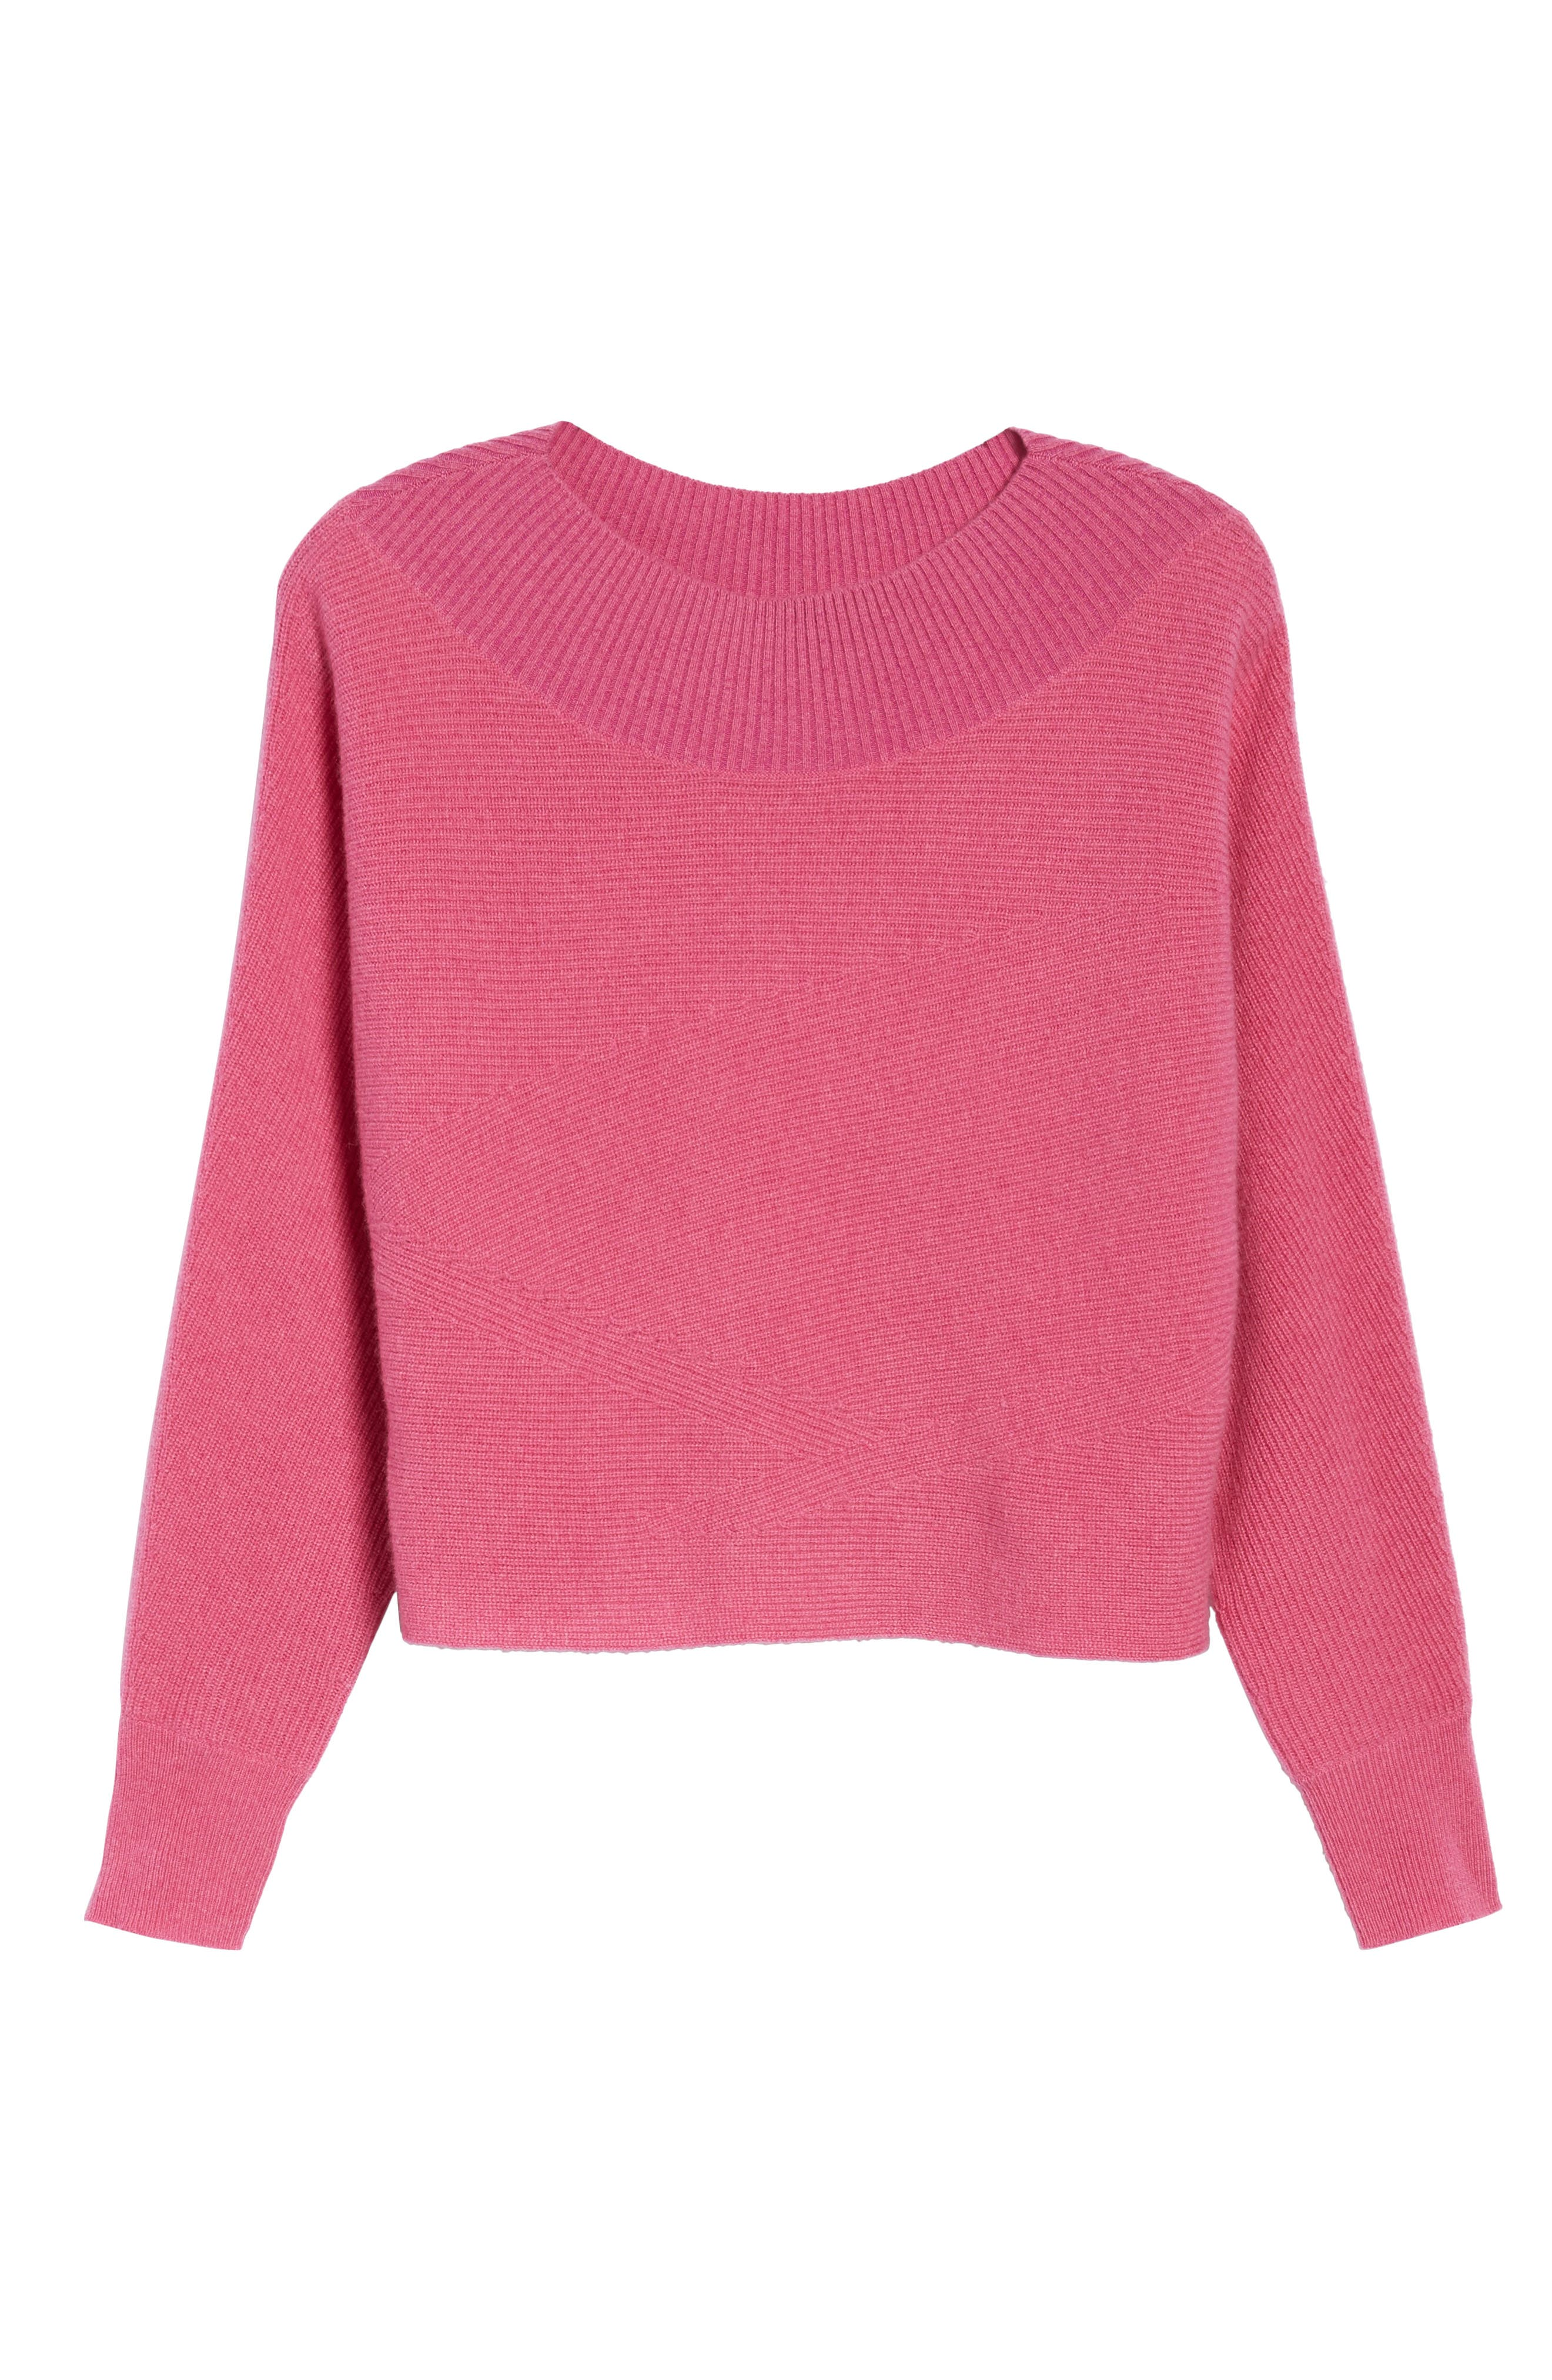 Dolman Sleeve Cashmere Sweater,                             Alternate thumbnail 12, color,